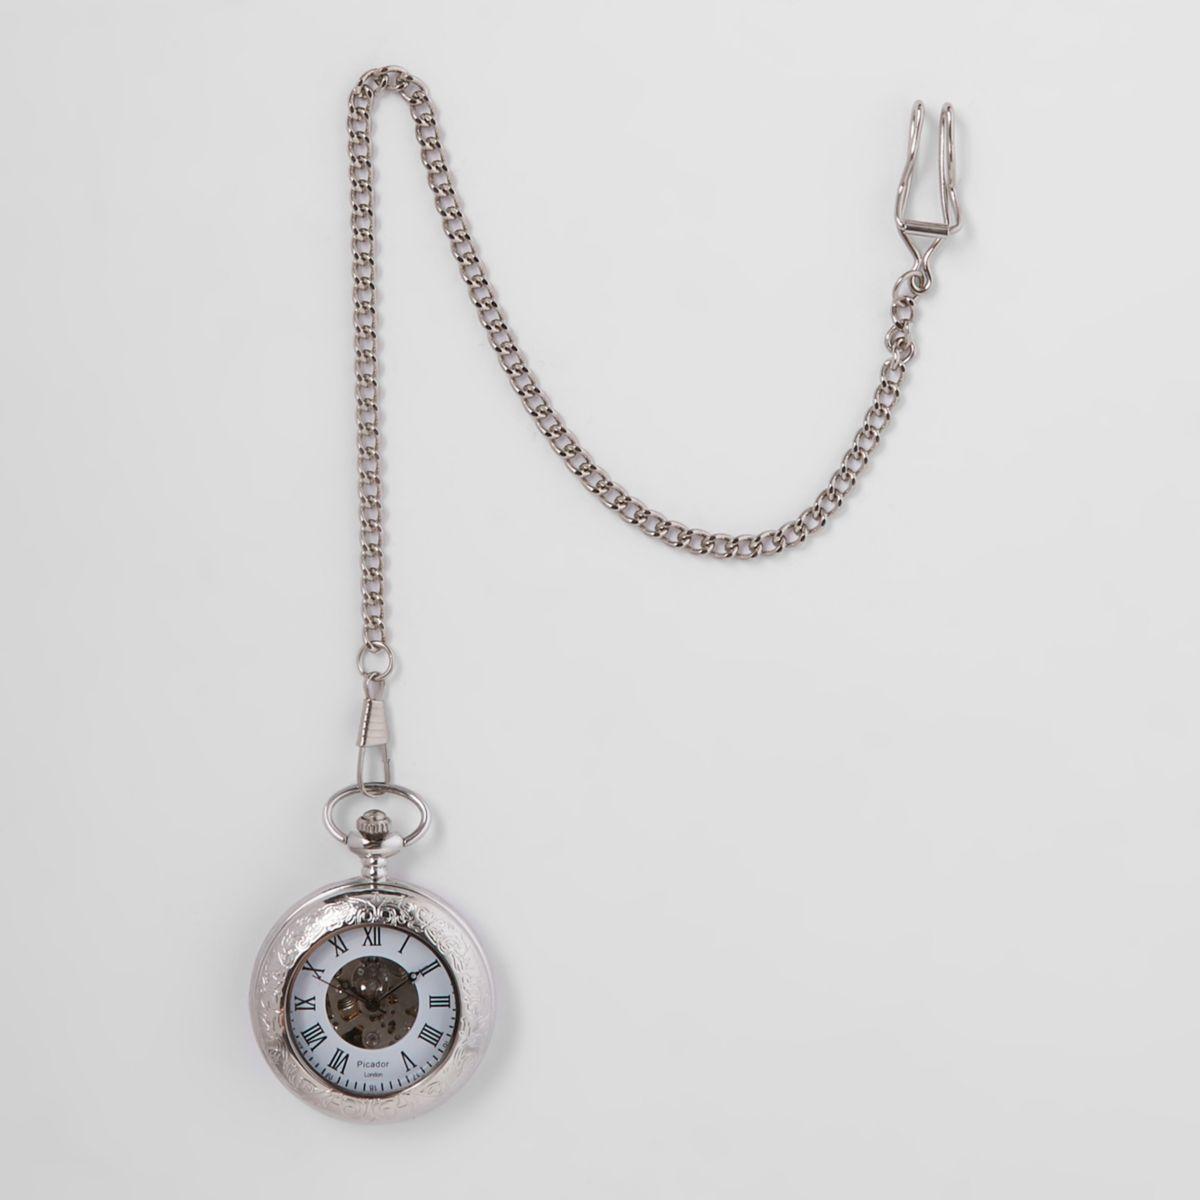 Silver tone open front pocket watch